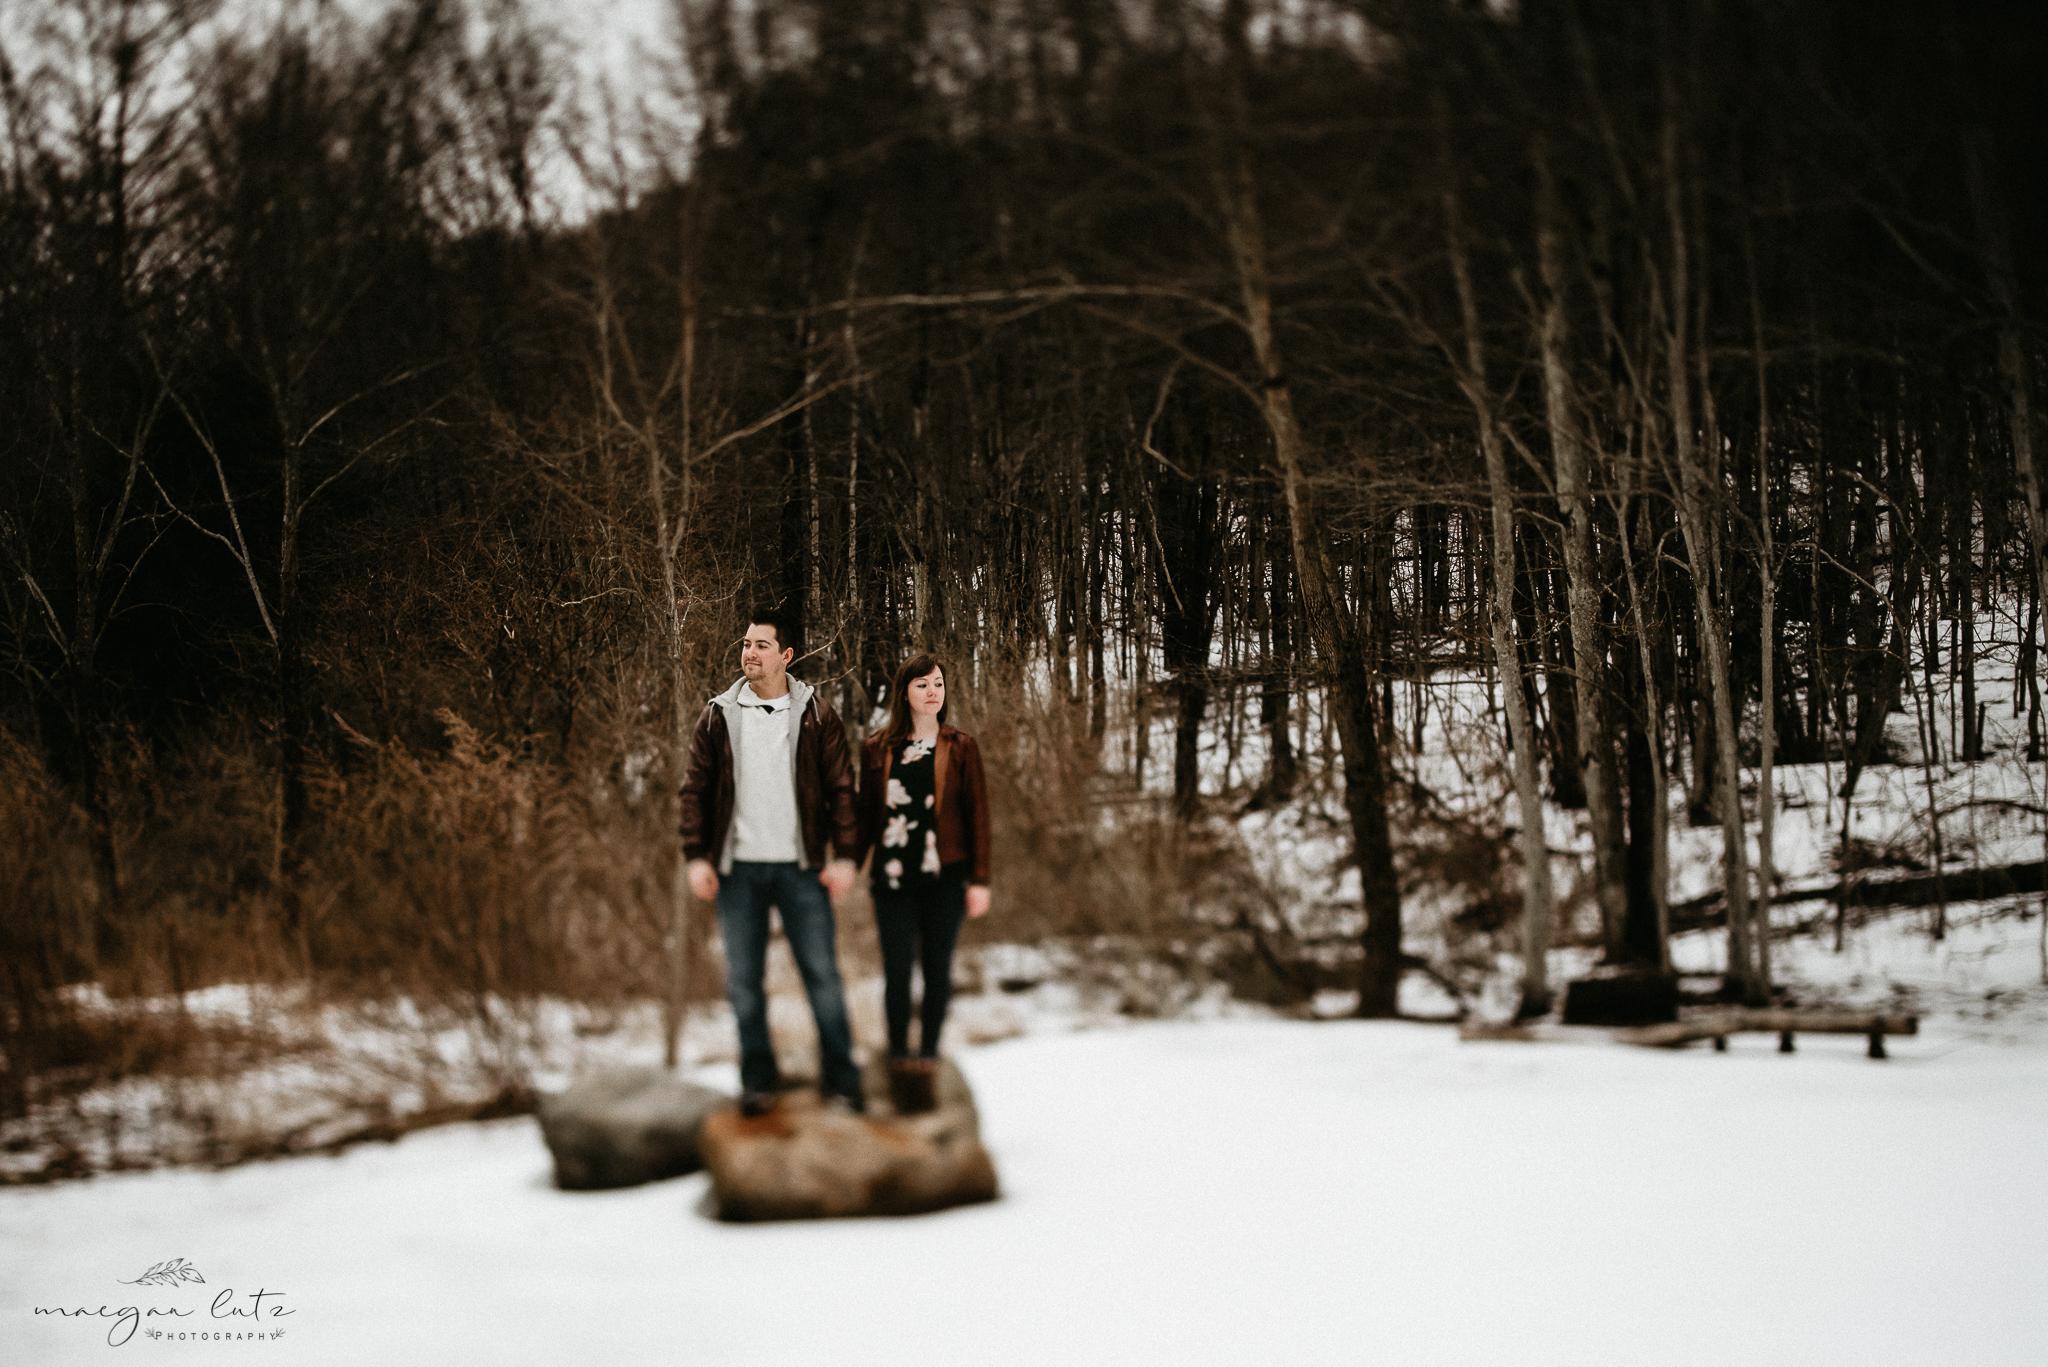 Nicole & Daniel - Engagement Session at Nescopeck State Park